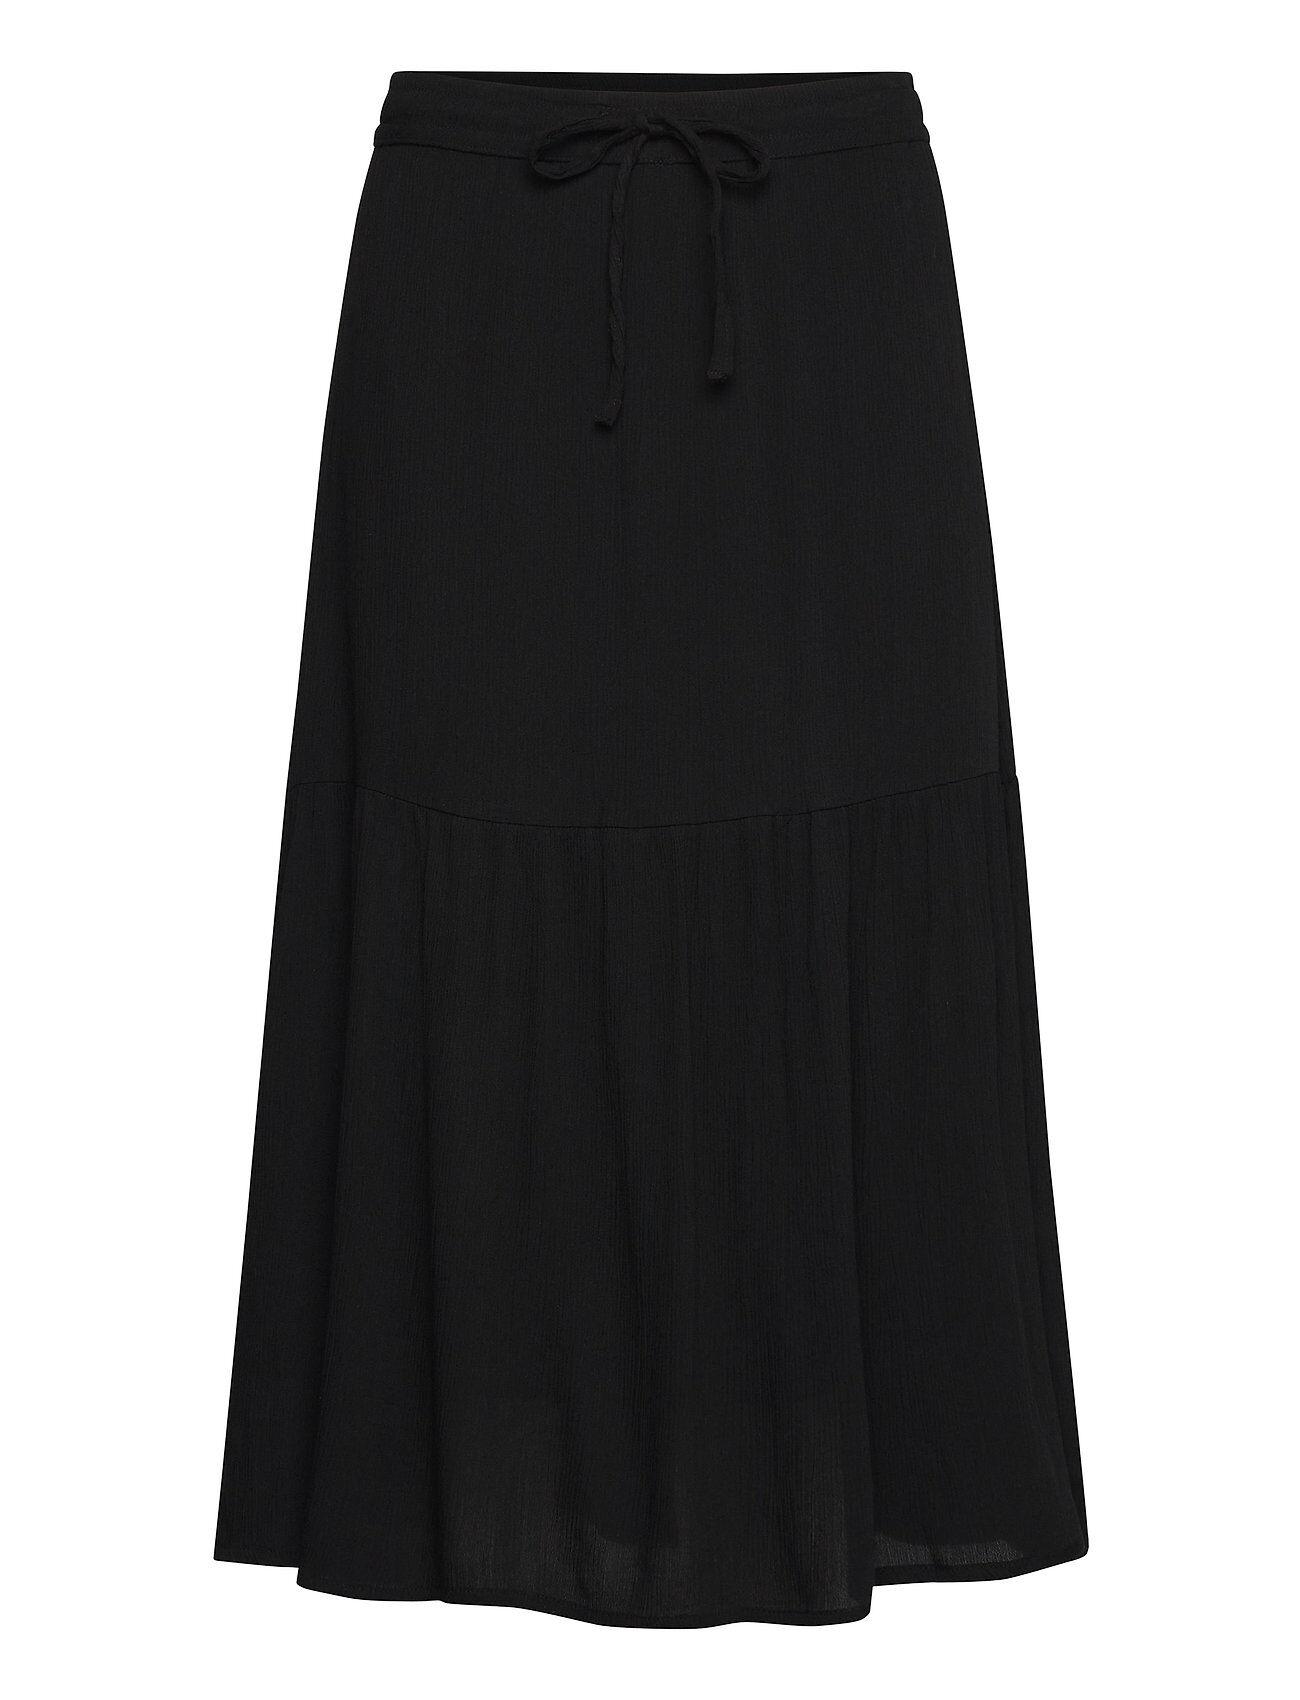 Brandtex Skirt-Light Woven Polvipituinen Hame Musta Brandtex